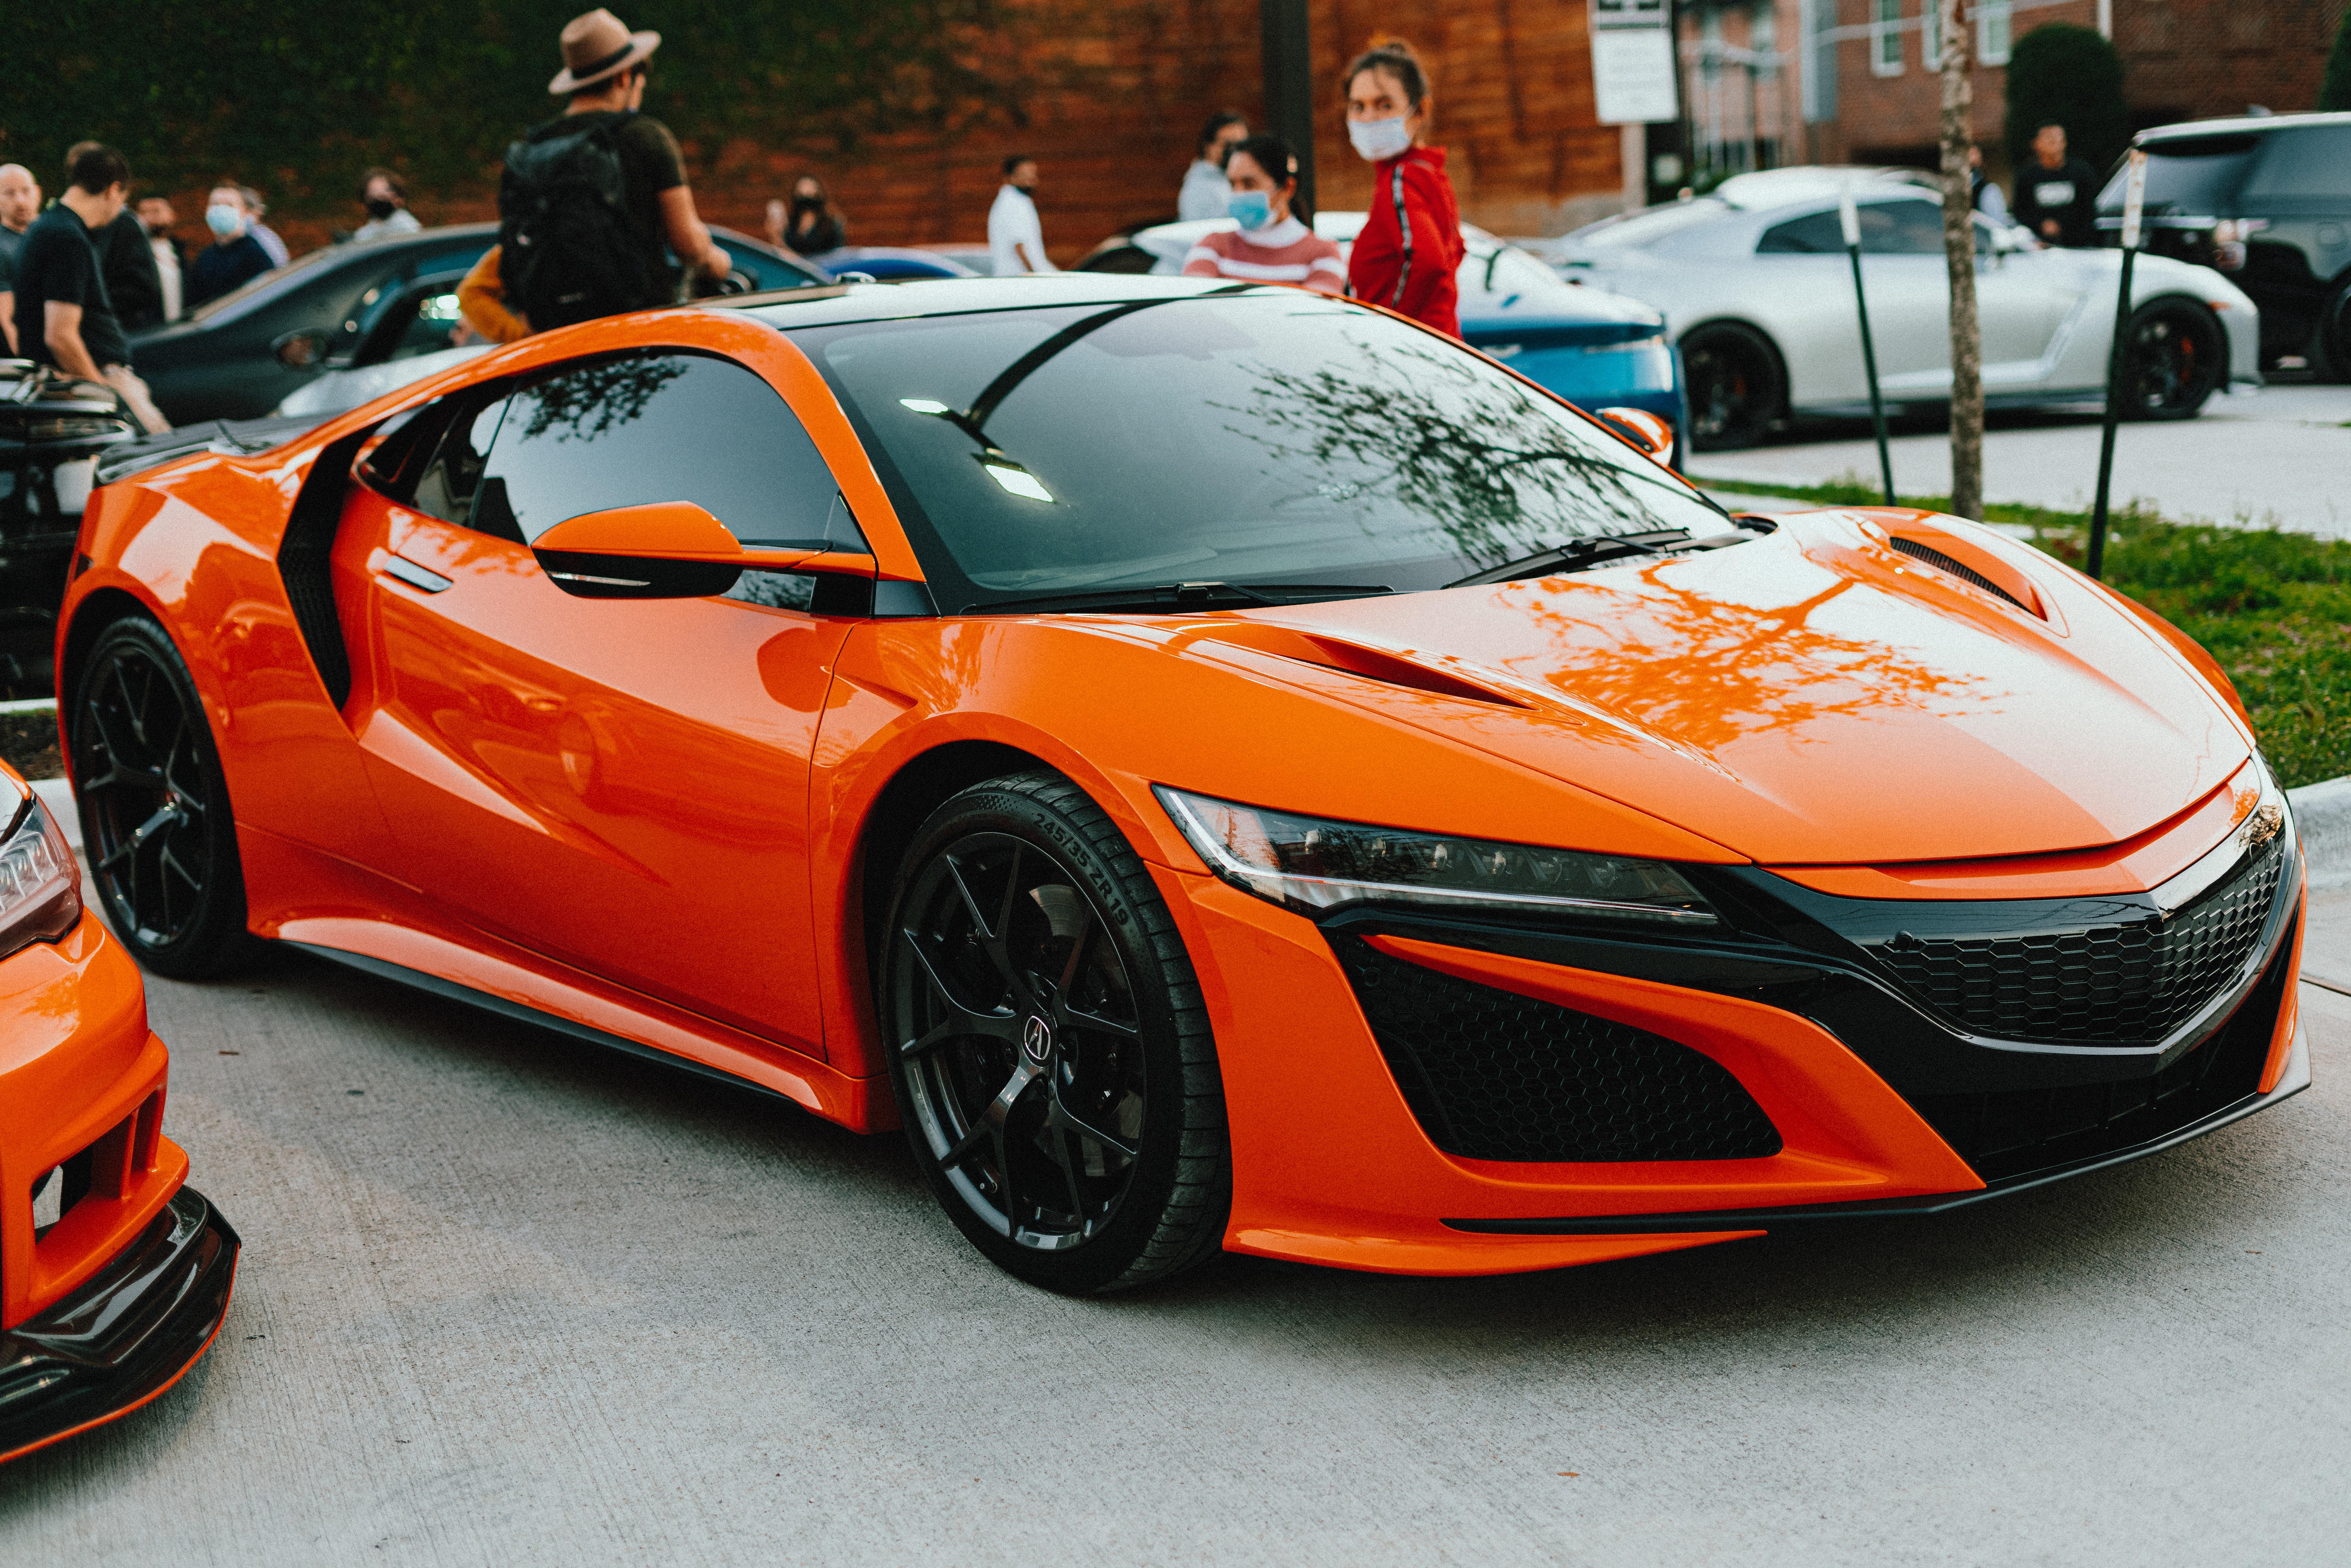 Image of orange Acura